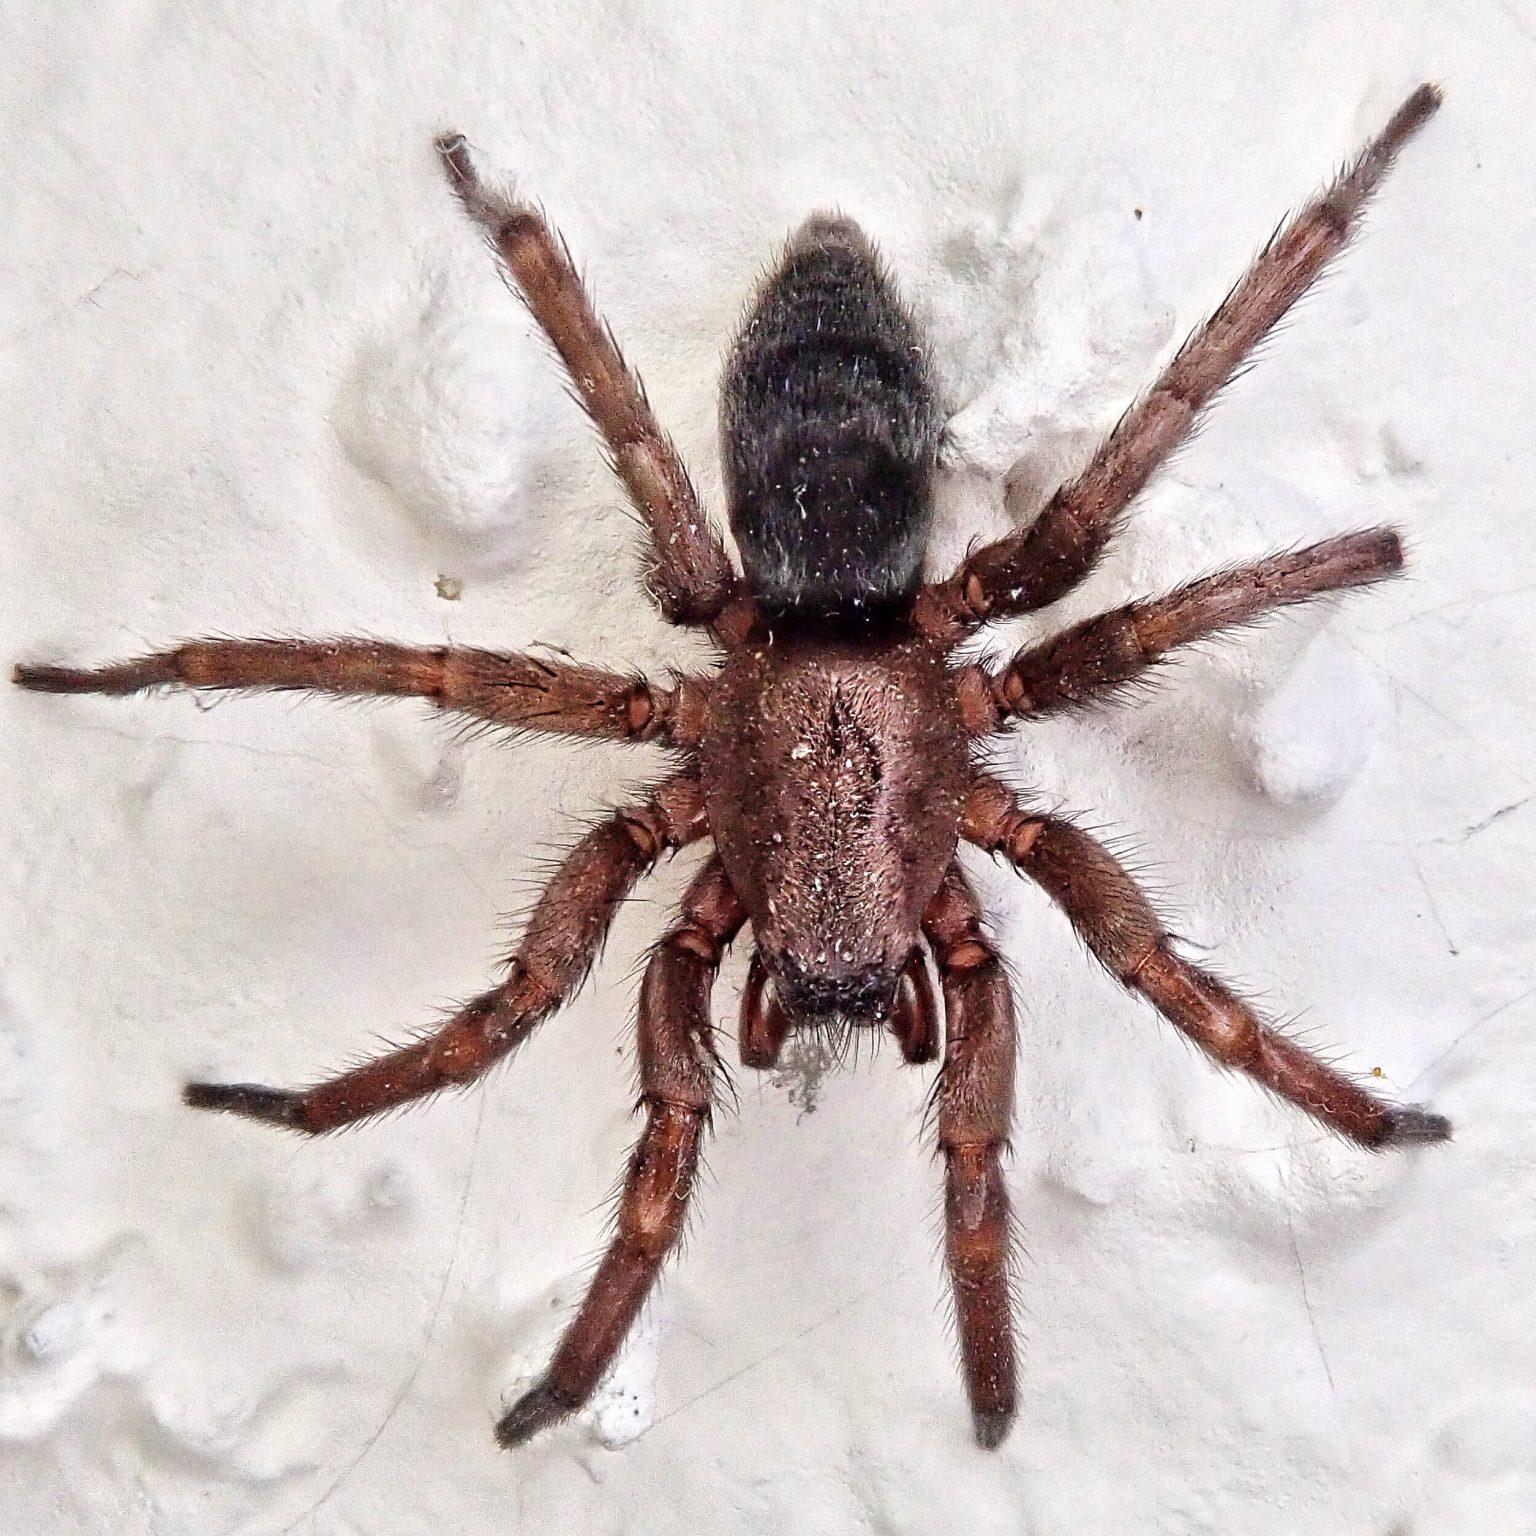 Scotophaeus blackwalli, Mouse Spider,